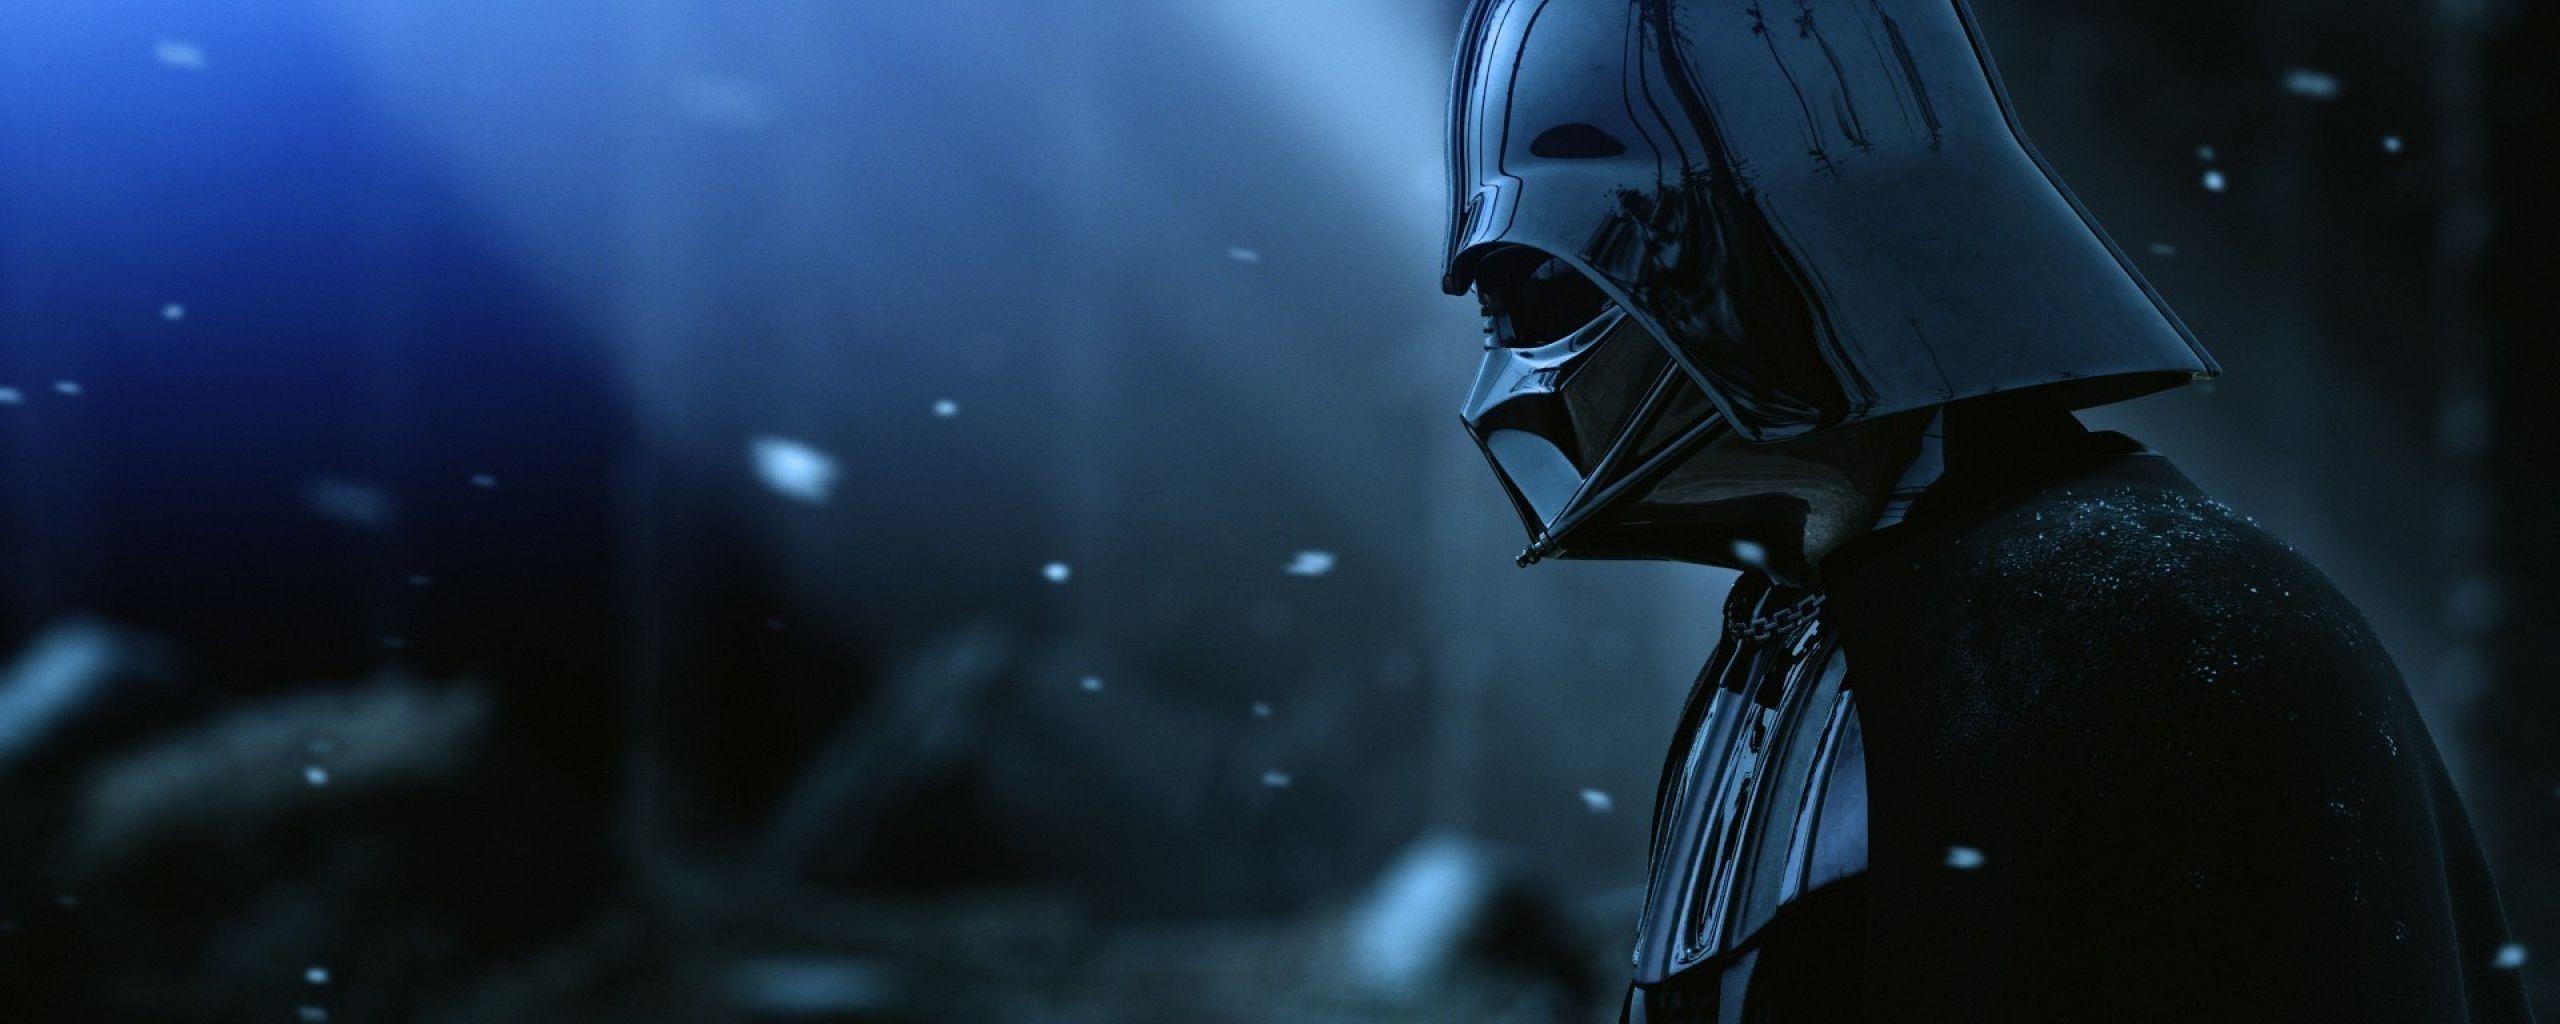 Star Wars Dual Screen Wallpapers Top Free Star Wars Dual Screen